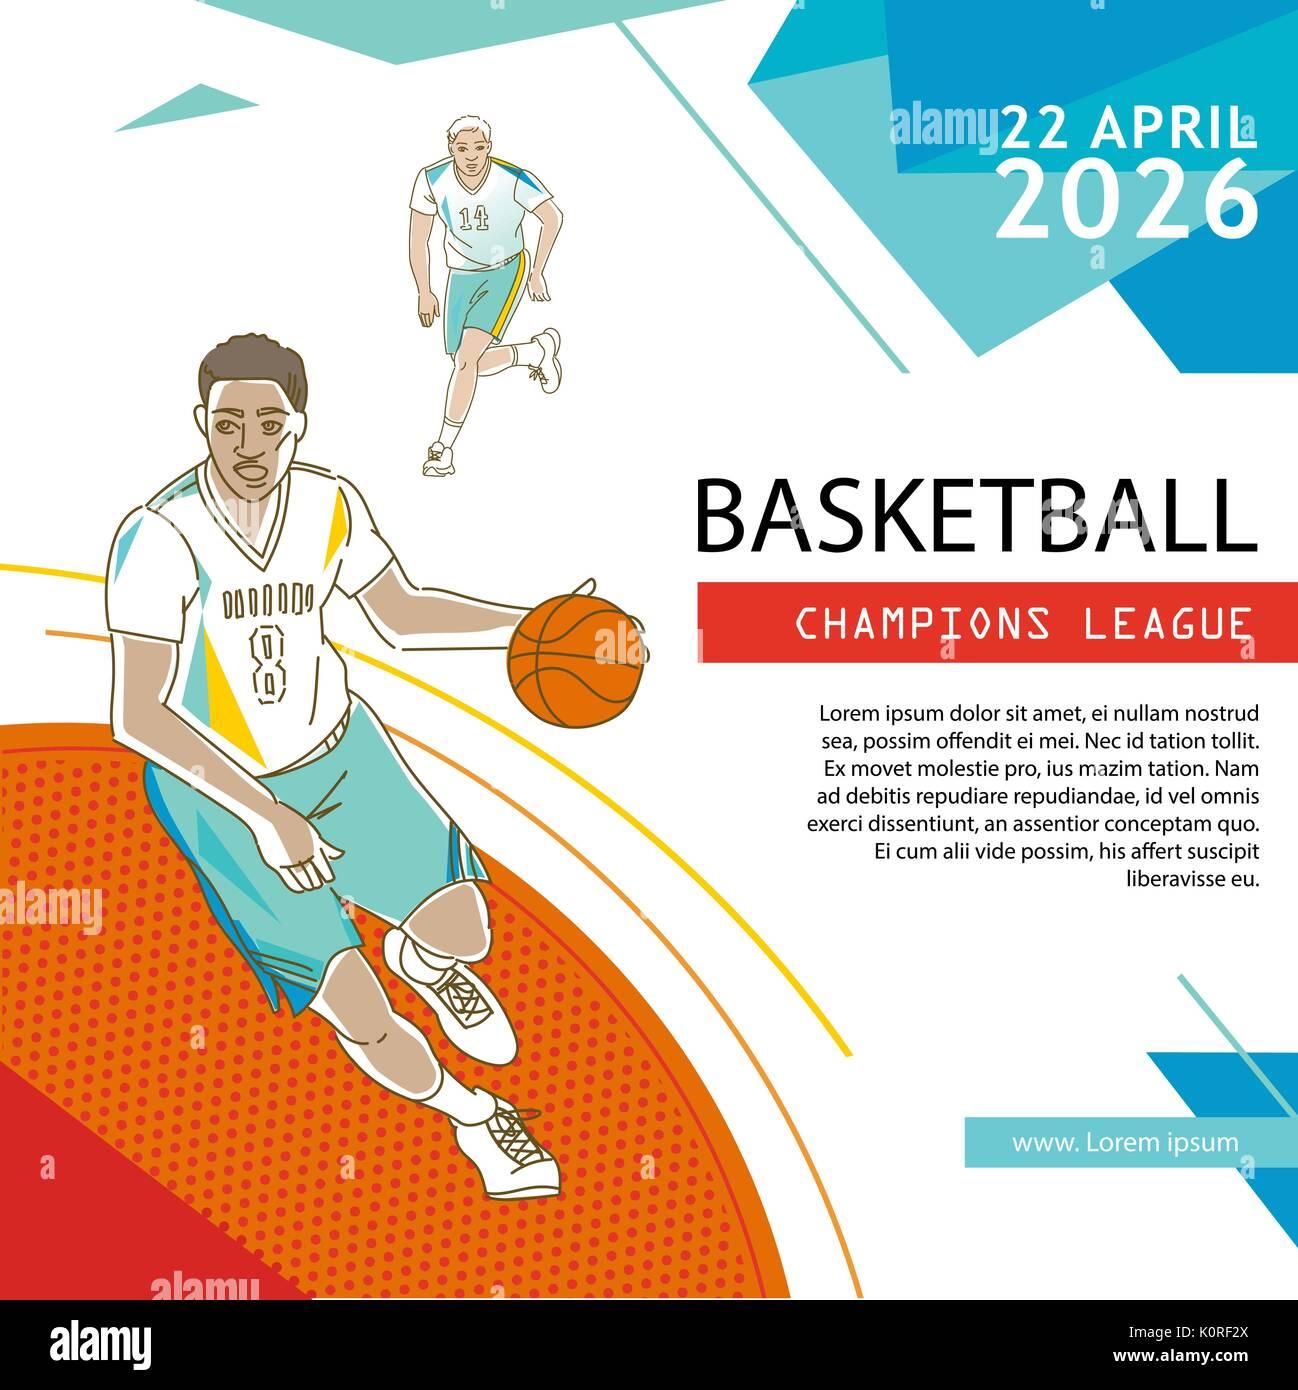 Basketball Flyer & Poster Cover Template Stock Vector Art ...